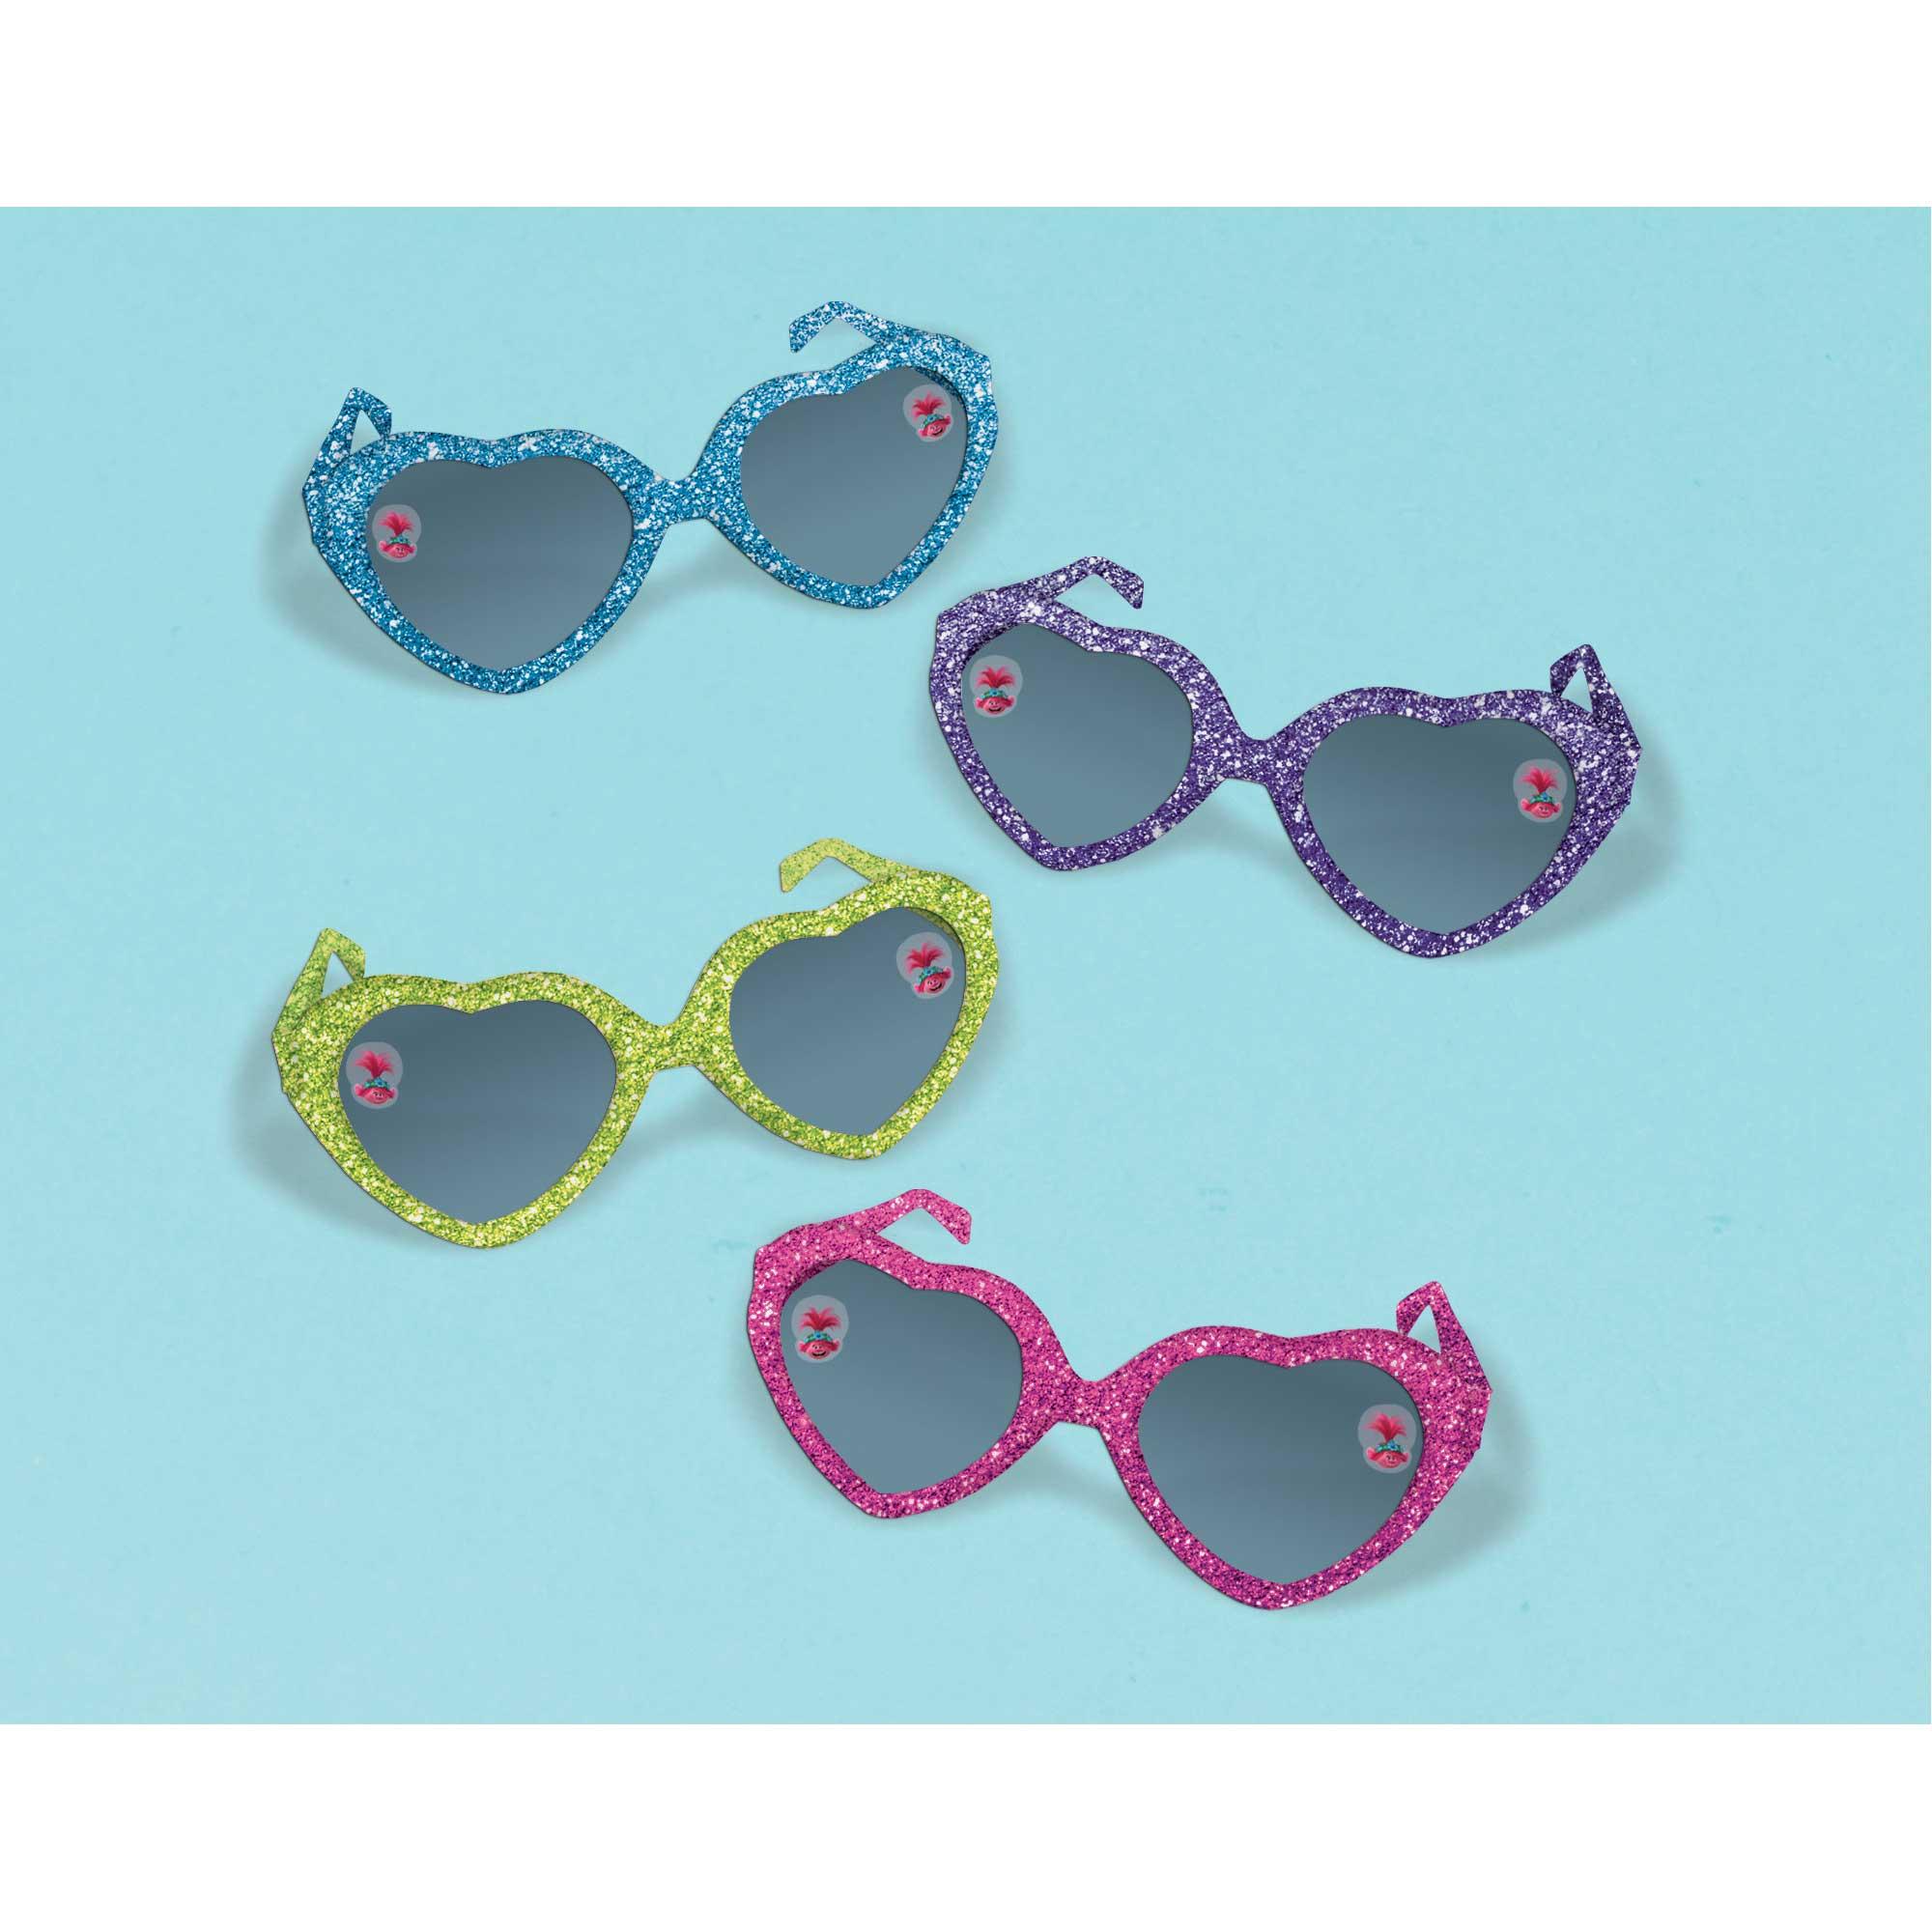 Trolls World Tour Glittered Heart Glasses